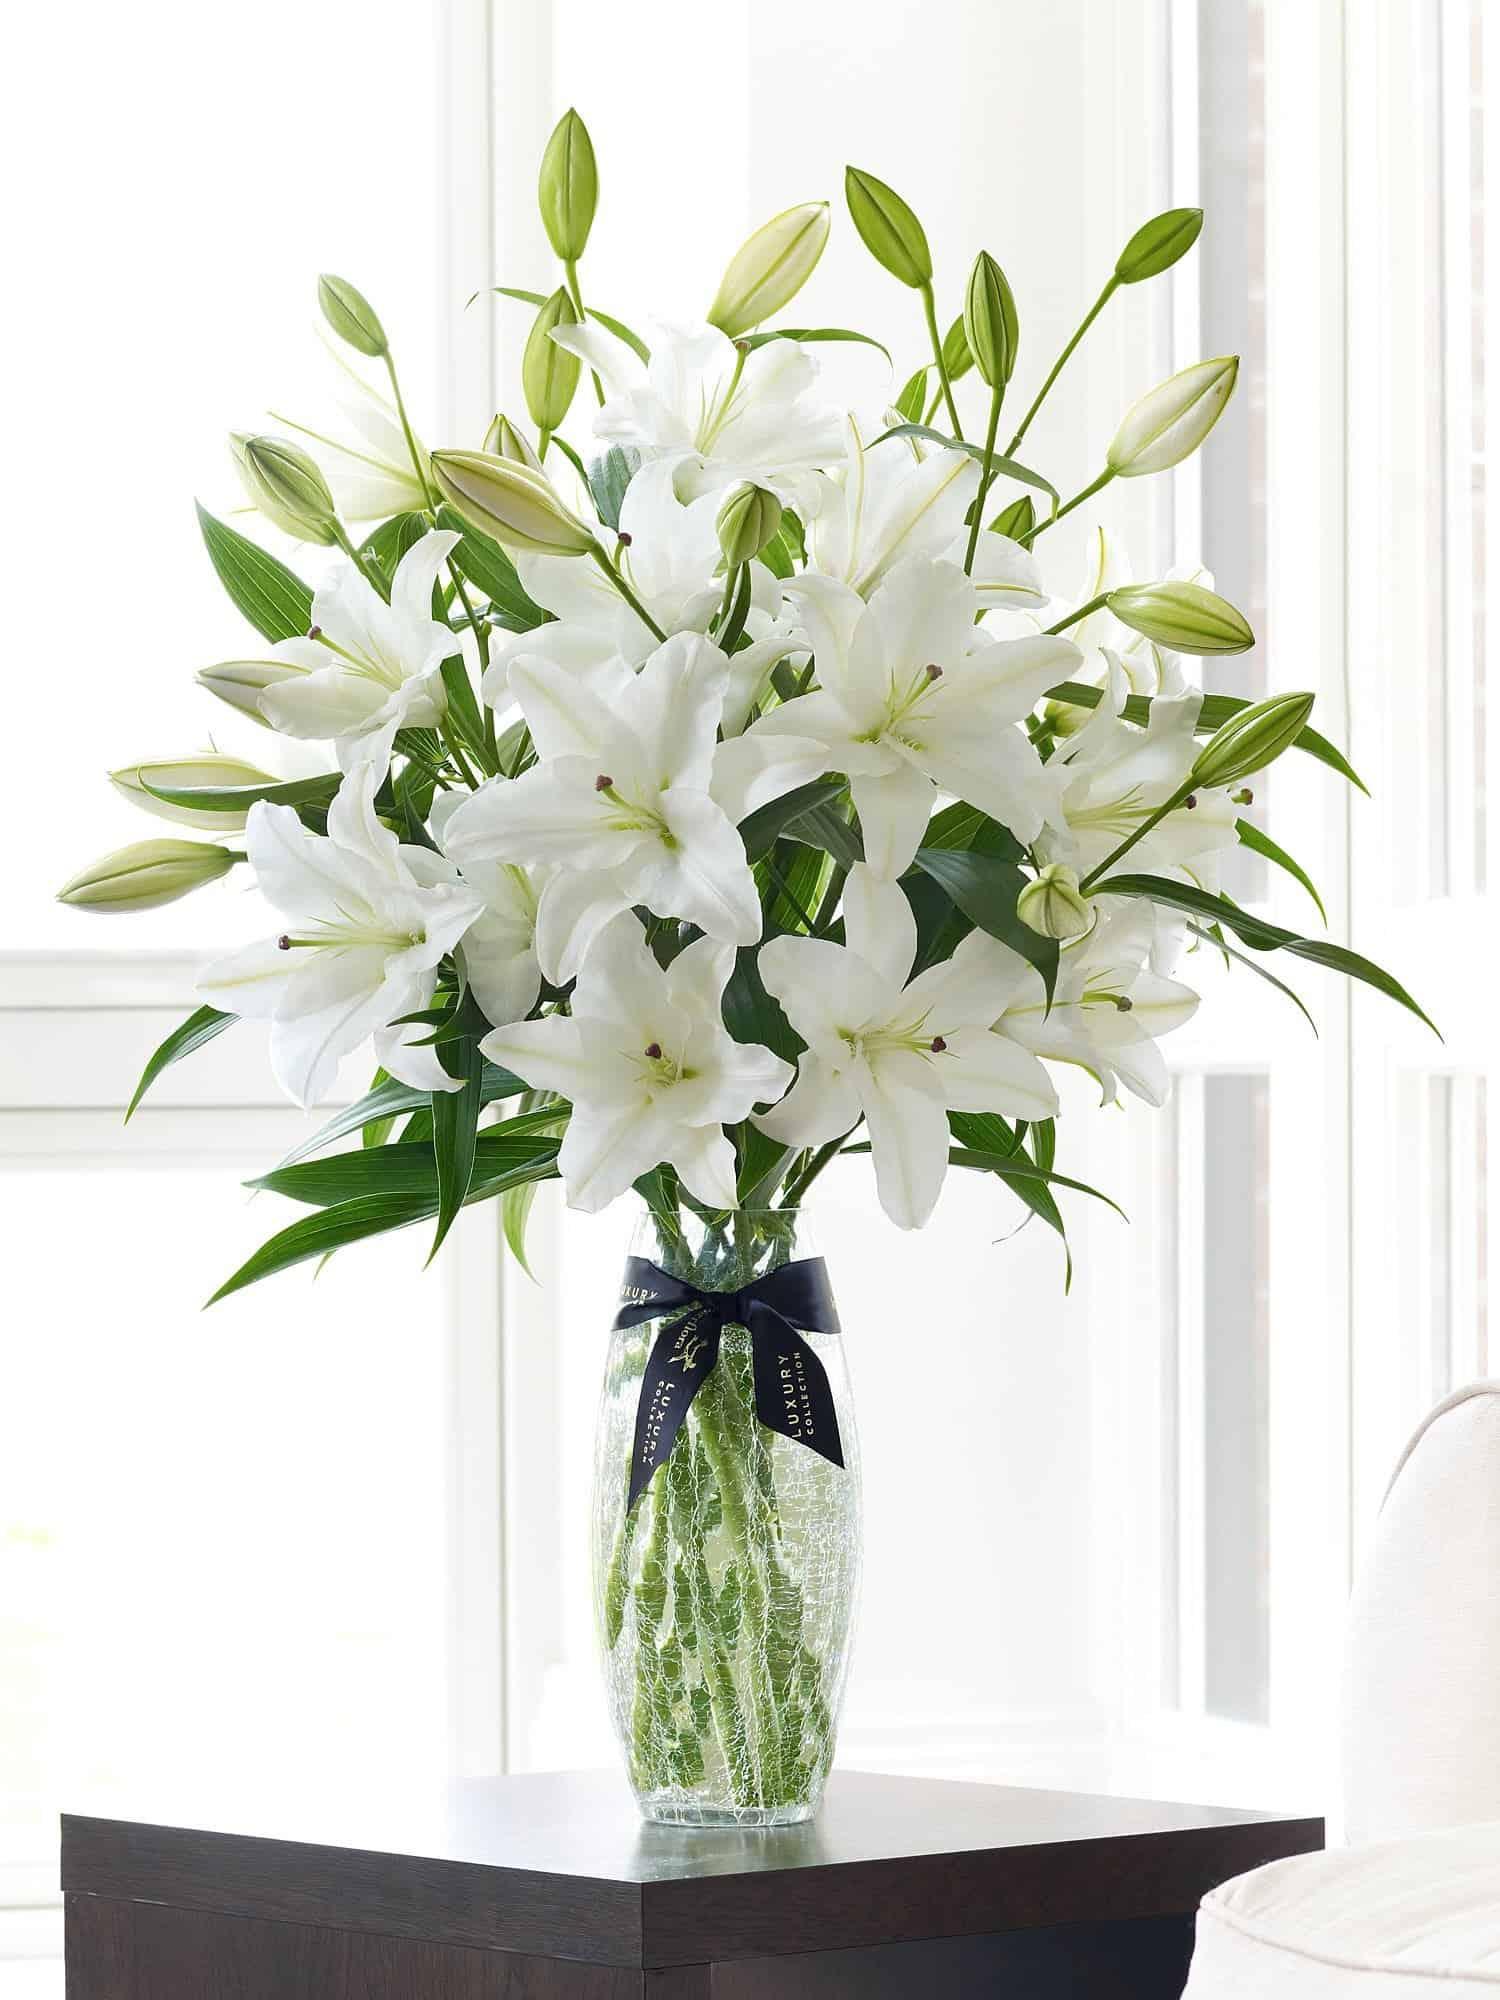 Luxury White Oriental Lily Vase Flowers Studio